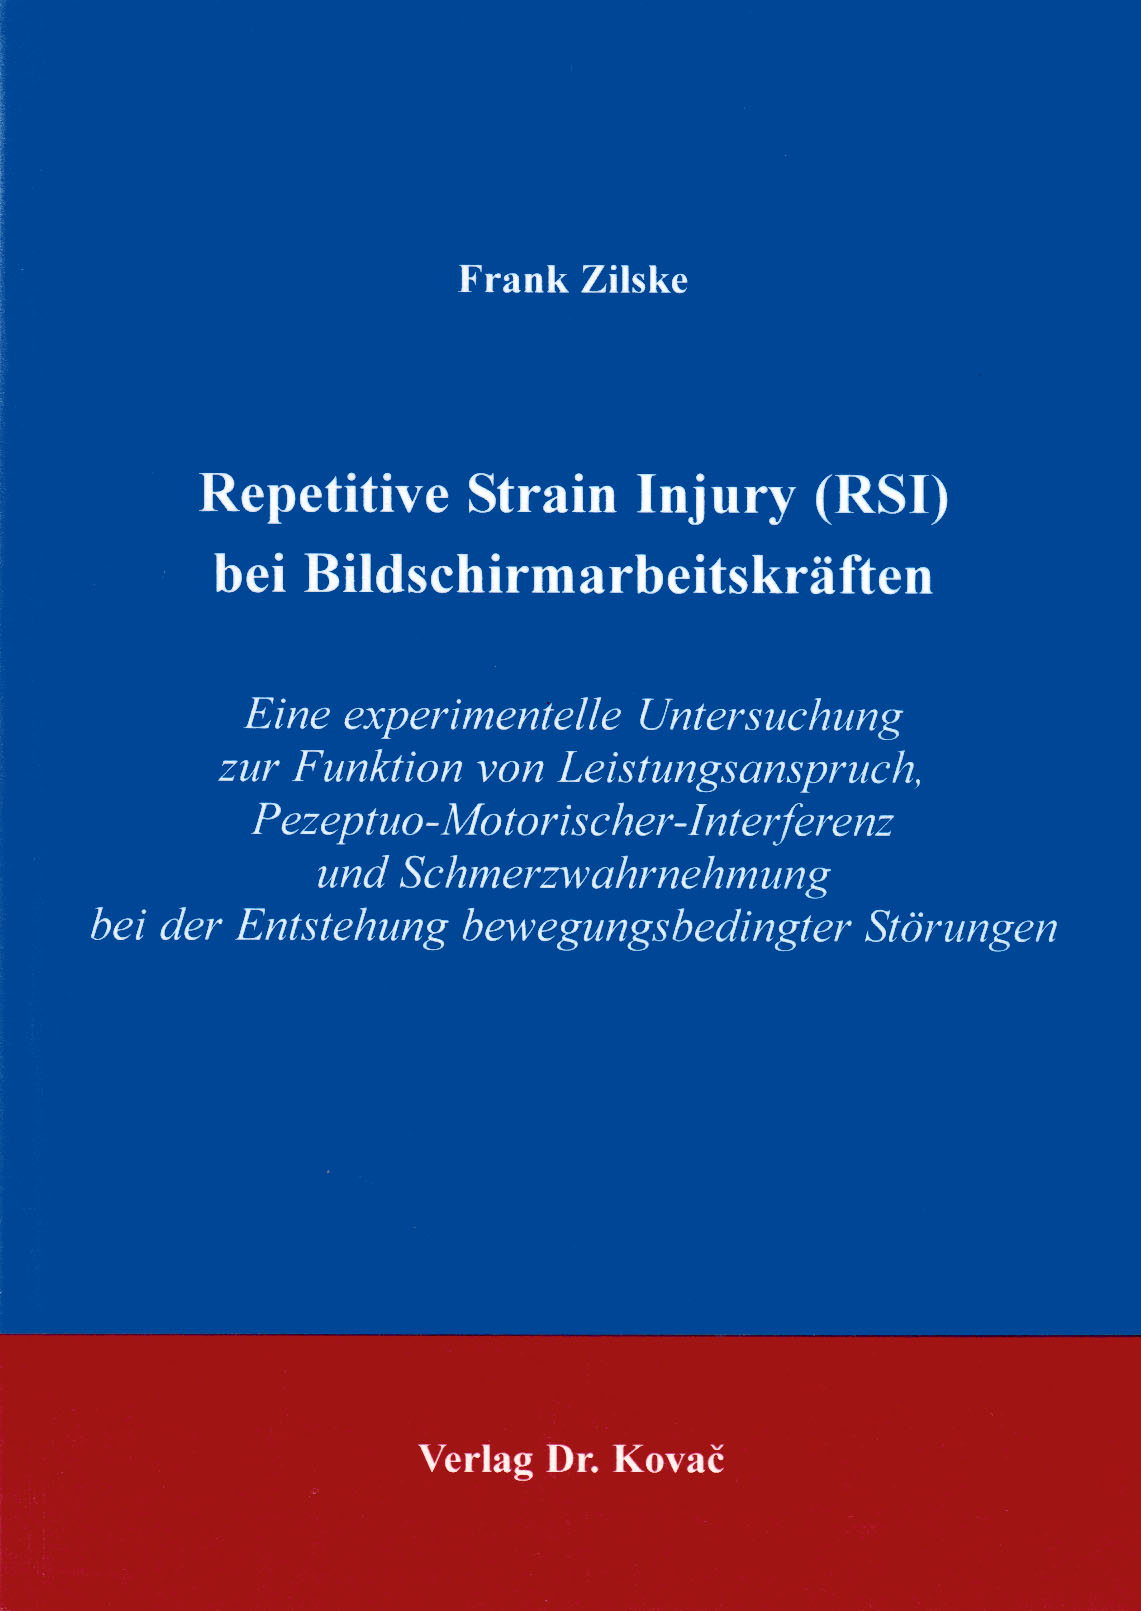 Cover: Repetitive Strain Injury (RSI) bei Bildschirmarbeitskräften